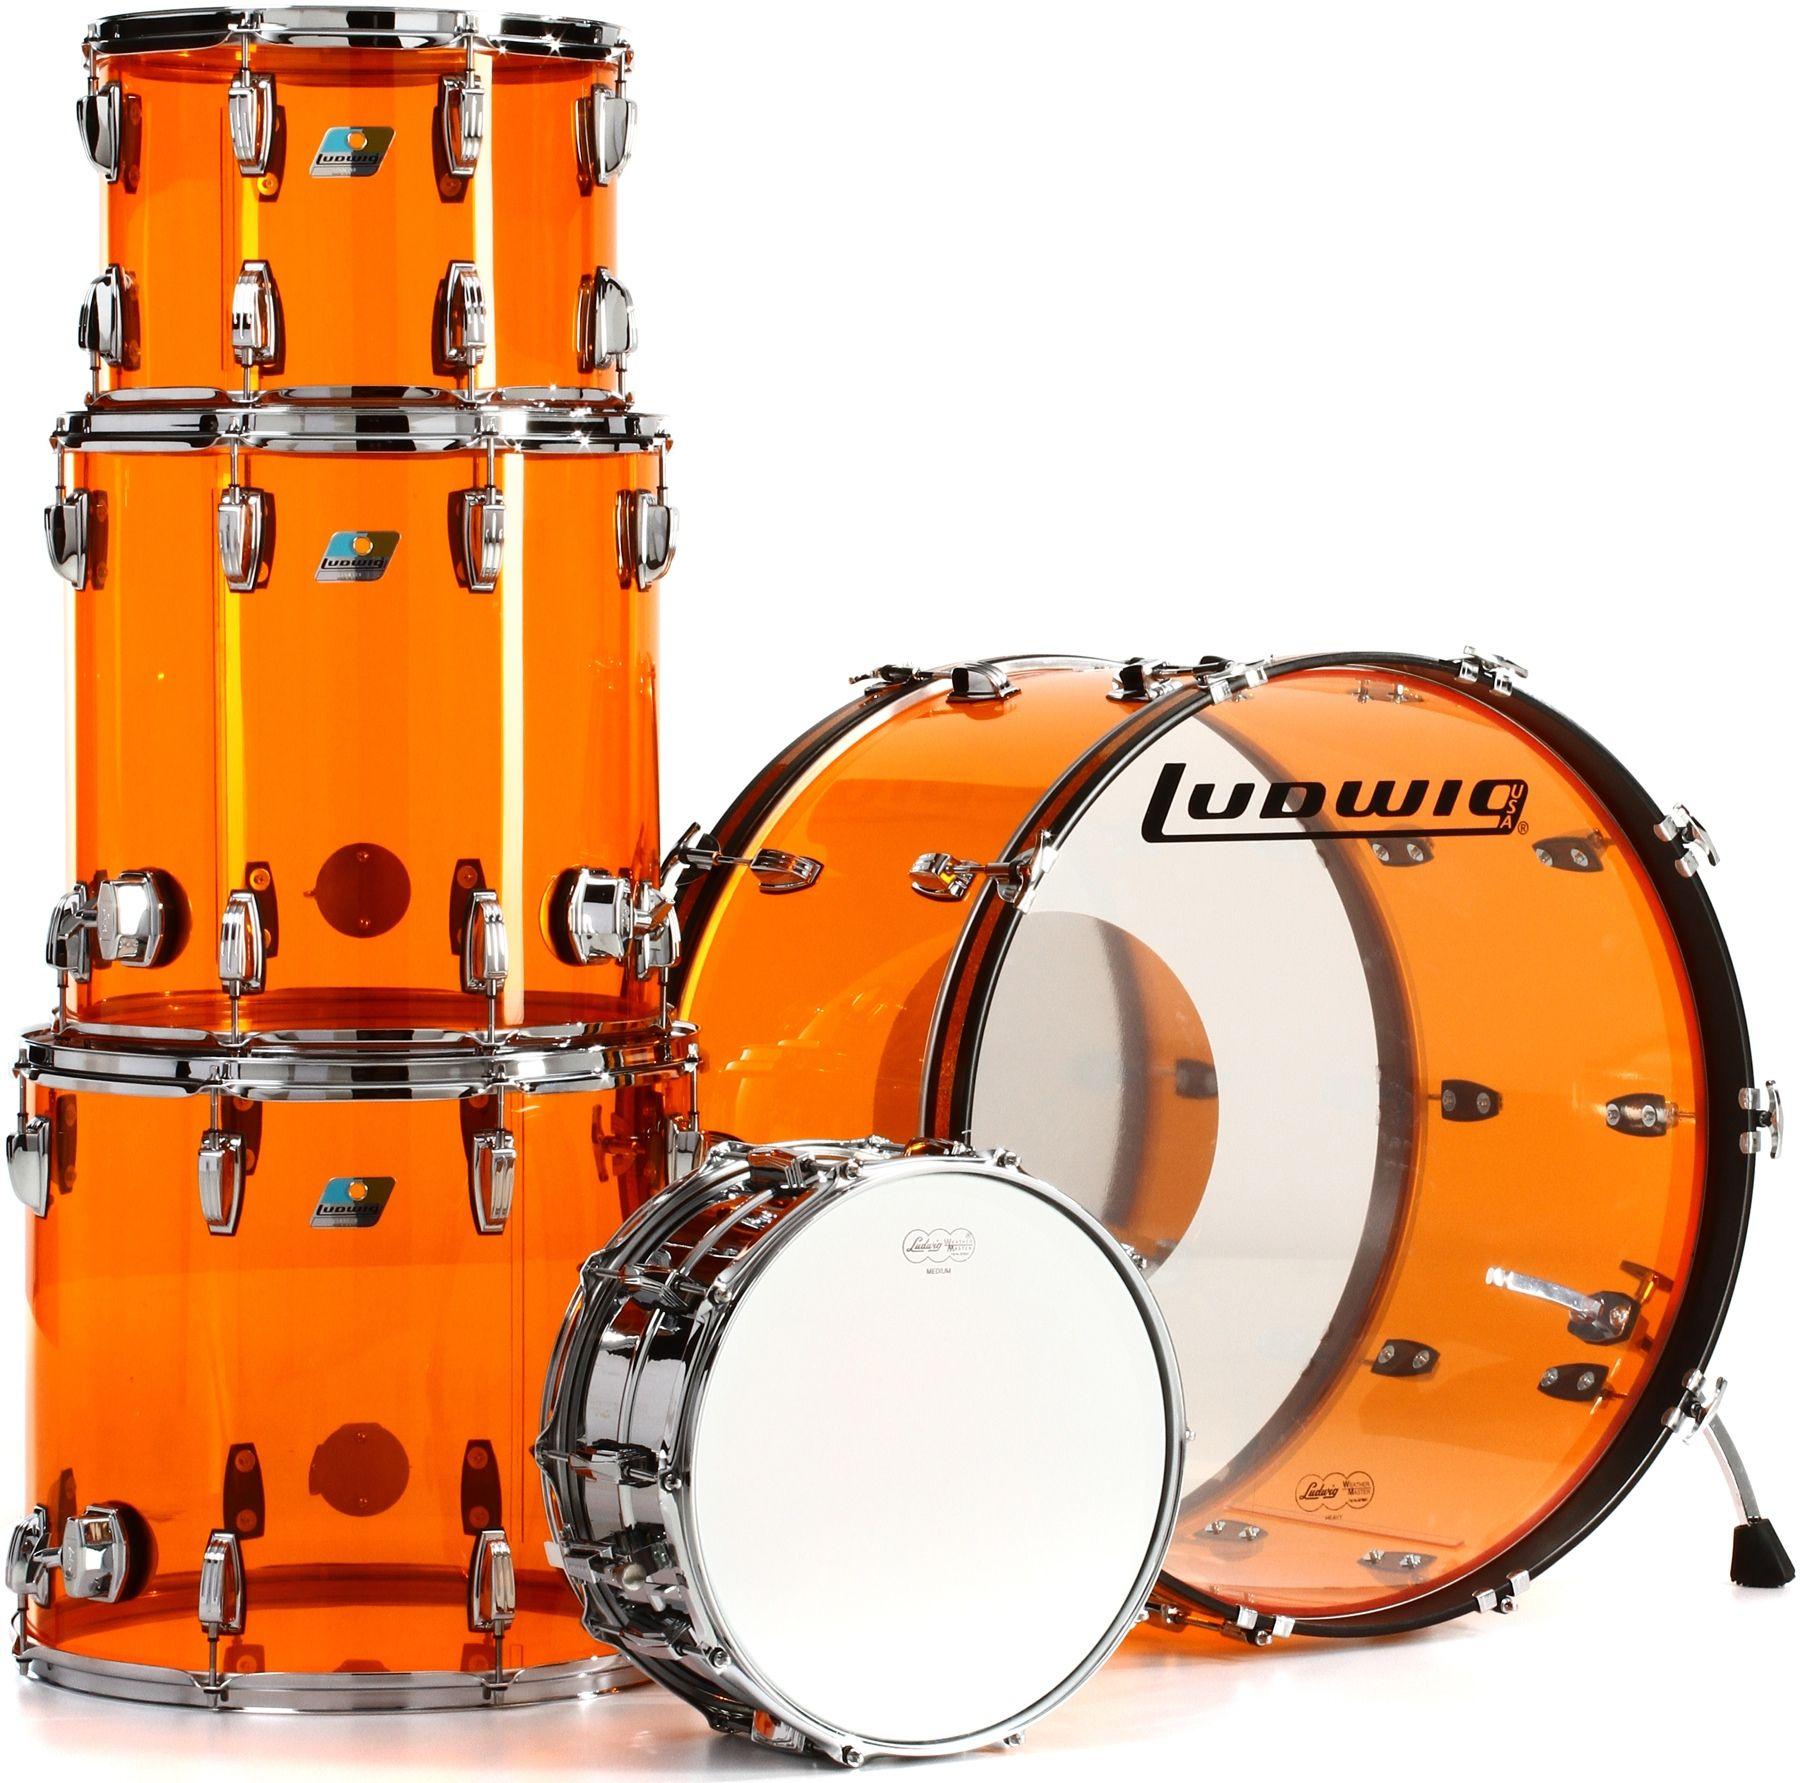 Ludwig Vistalite John Bonham Zep Set Shell Pack With Snare Drum Amber Ludwig Drums Drums Vintage Drums